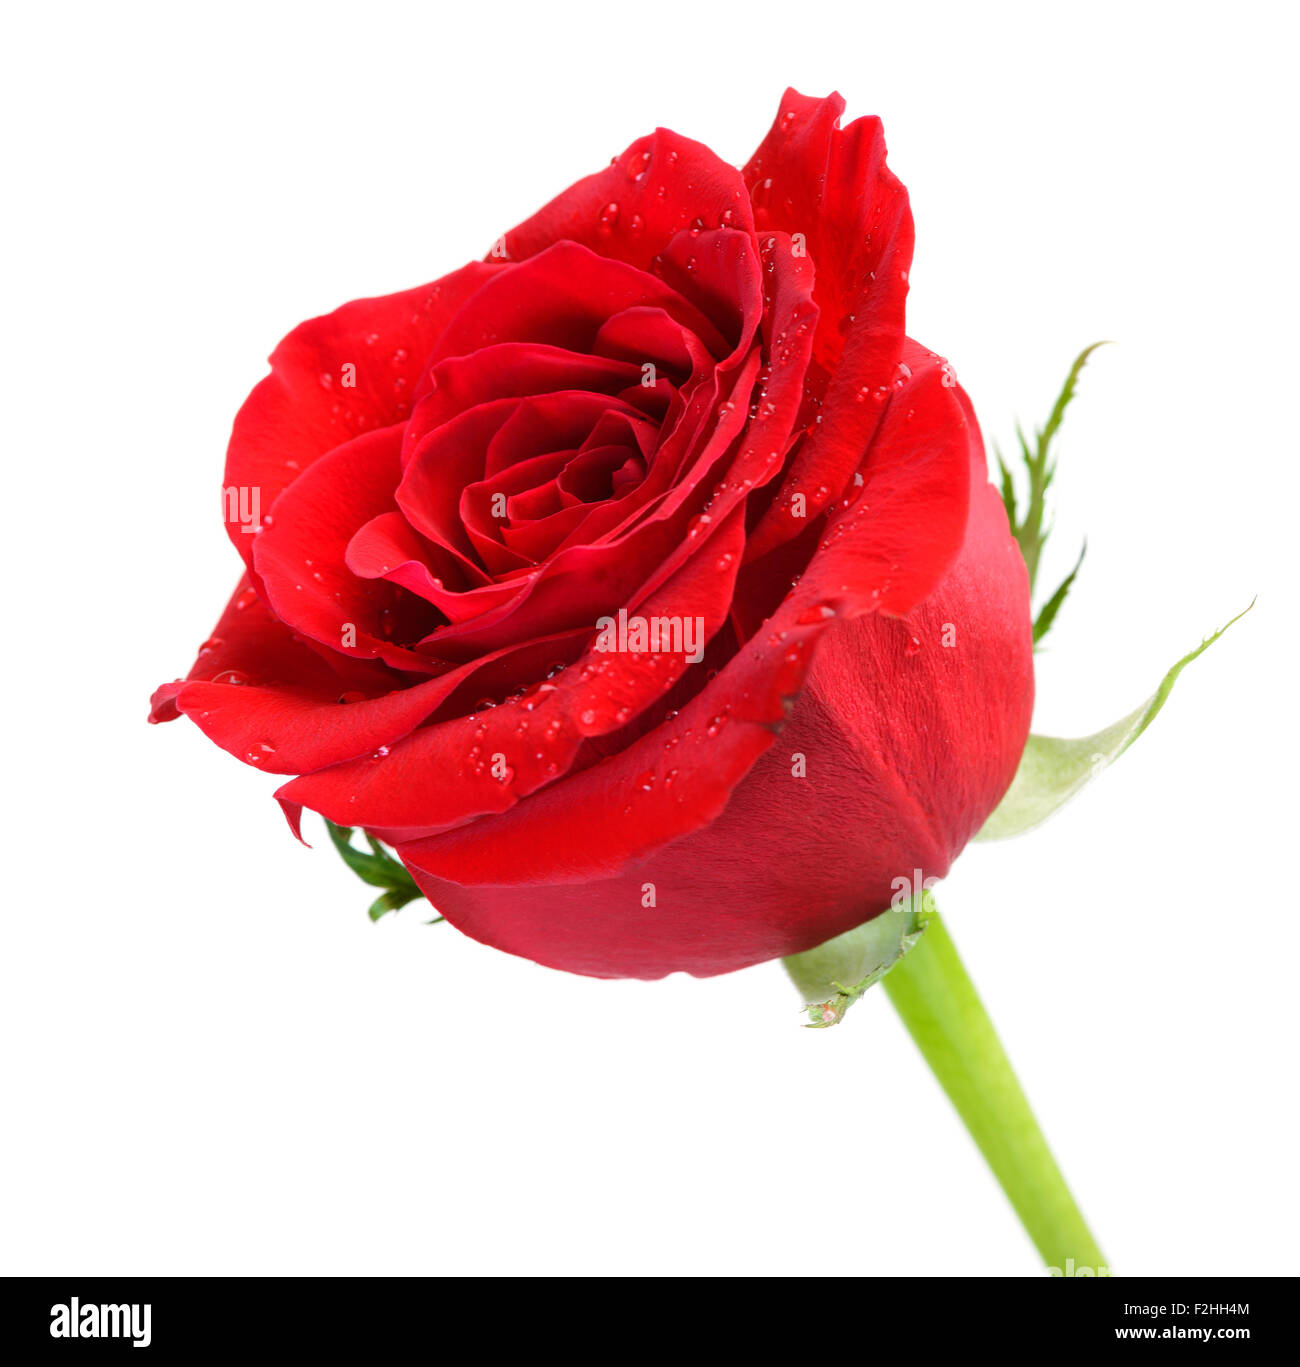 perfekte rote rose, isoliert auf weiss Stockbild